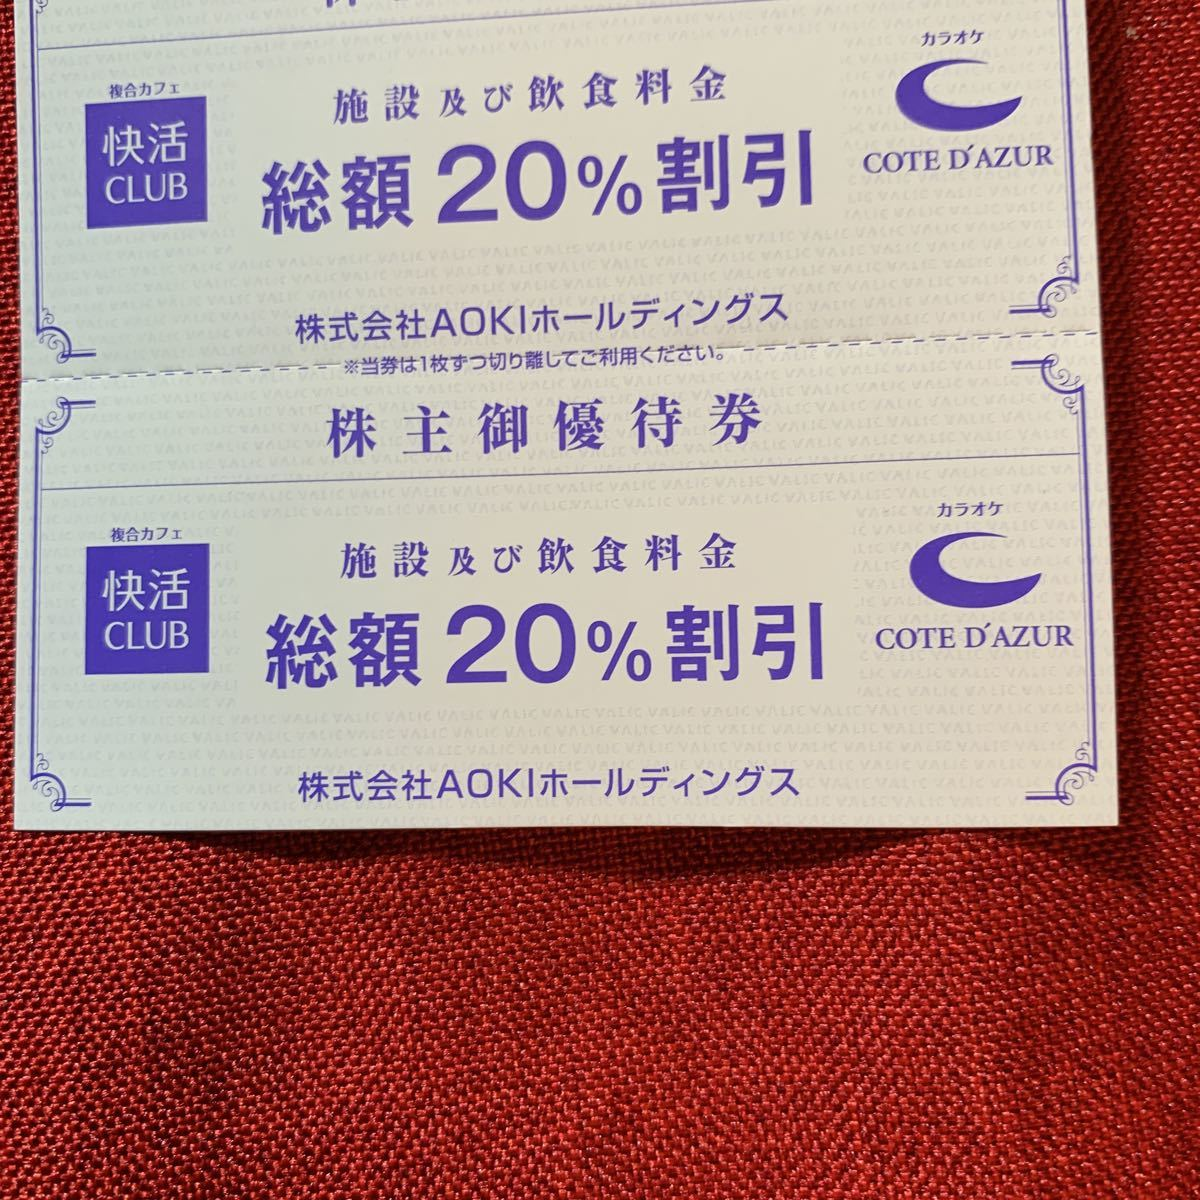 AOKIアオキホールディングス株主優待 快活clubコートダジュール優待20%割引券×5枚 20211231 複数個数あり_画像2